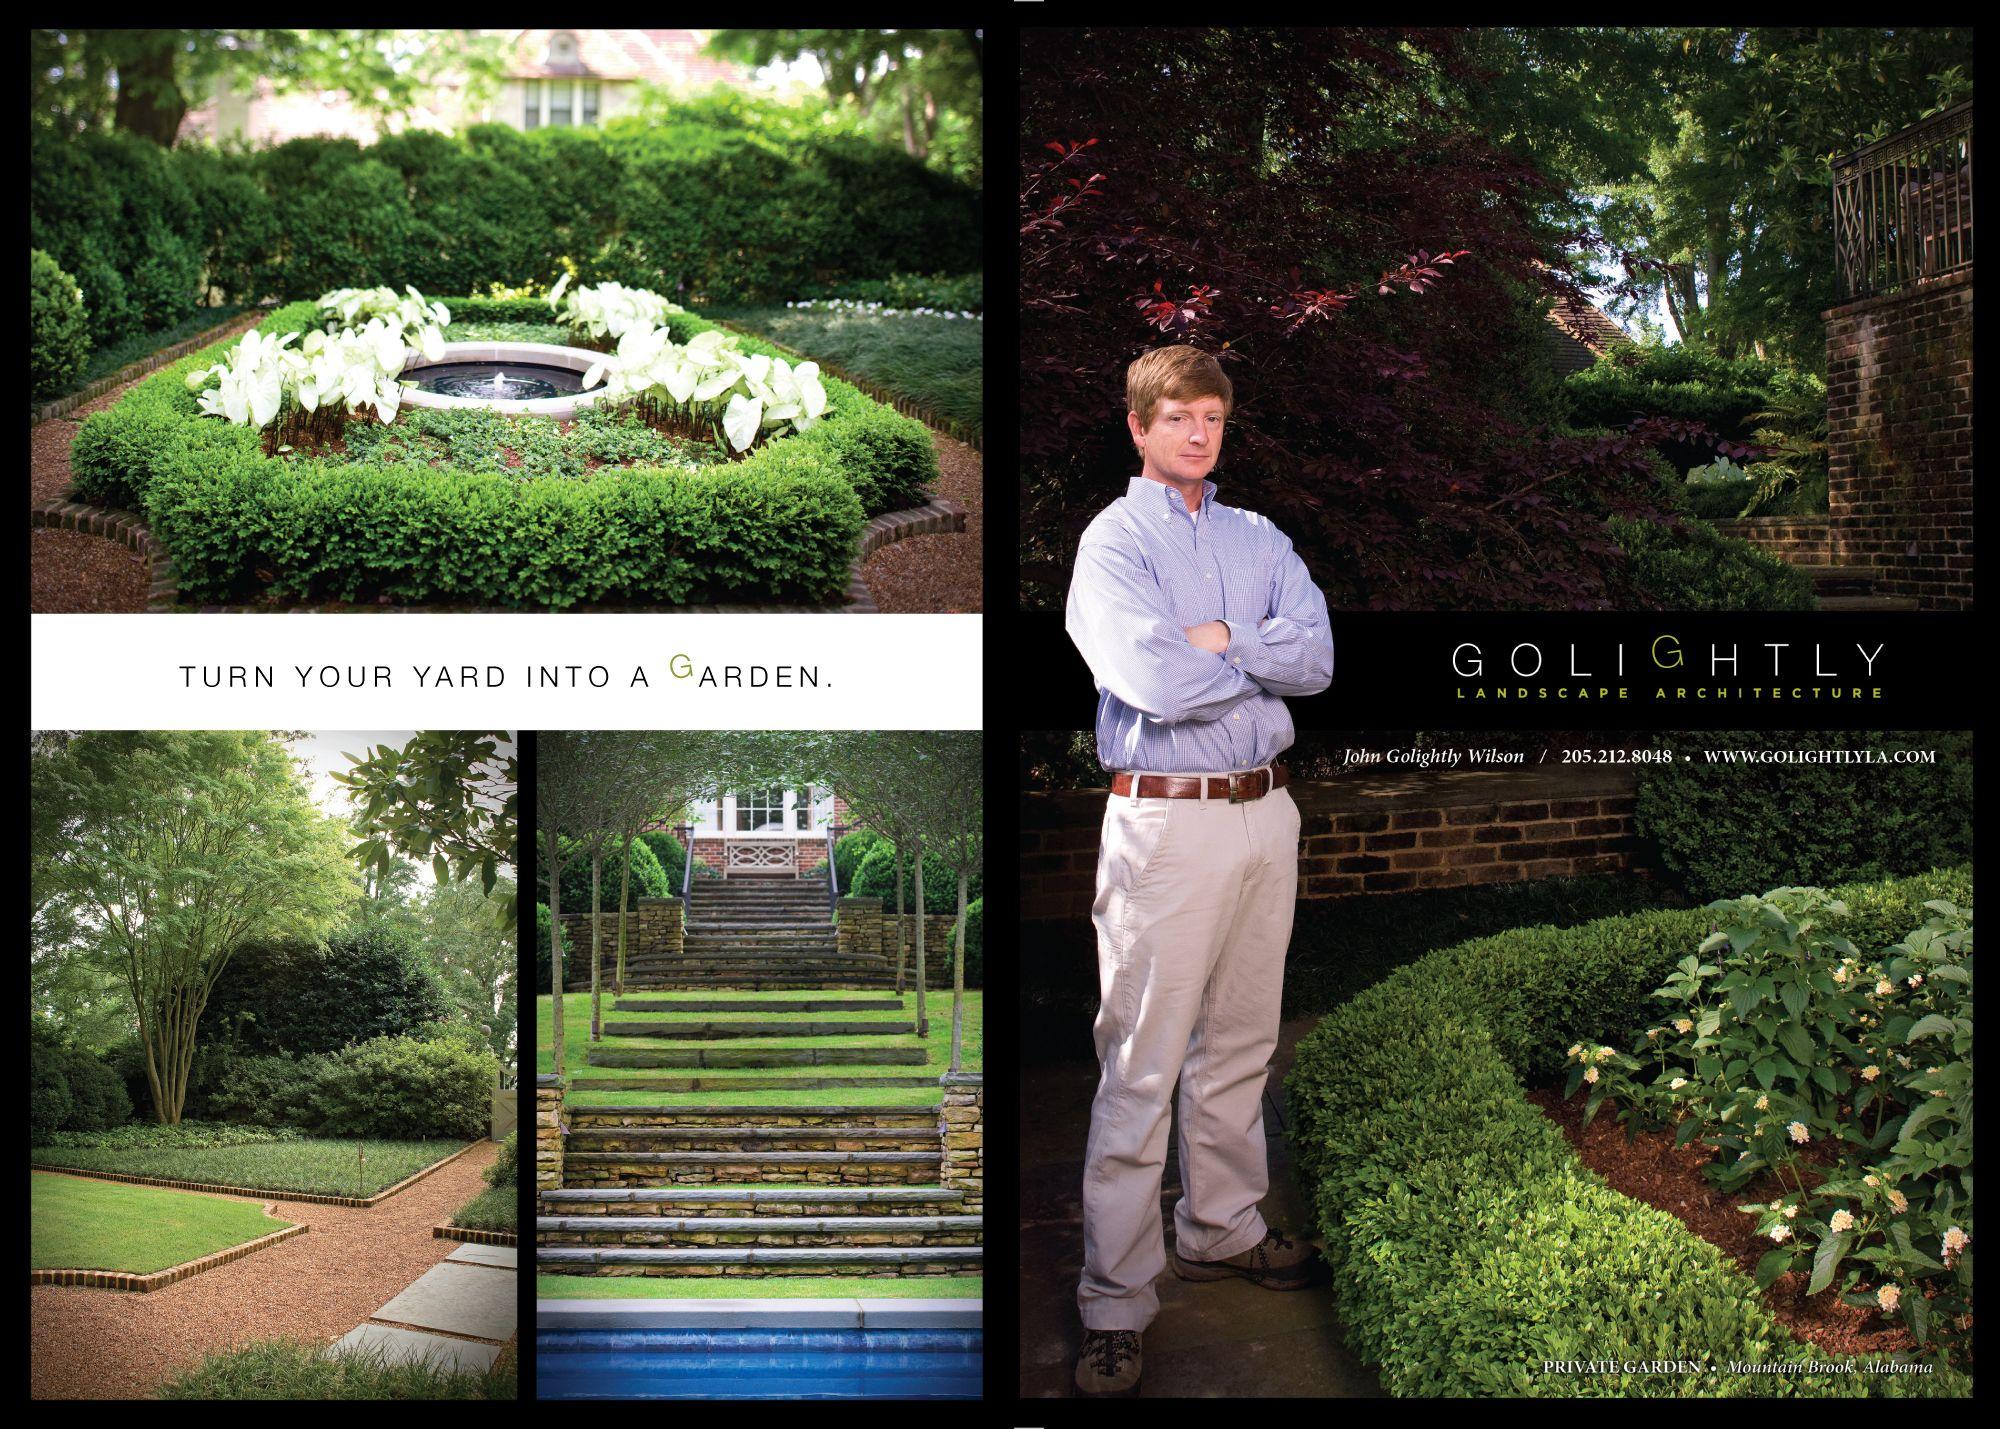 Golightly Landscape Architecture The Scout Guide : Birmingham, AL ...